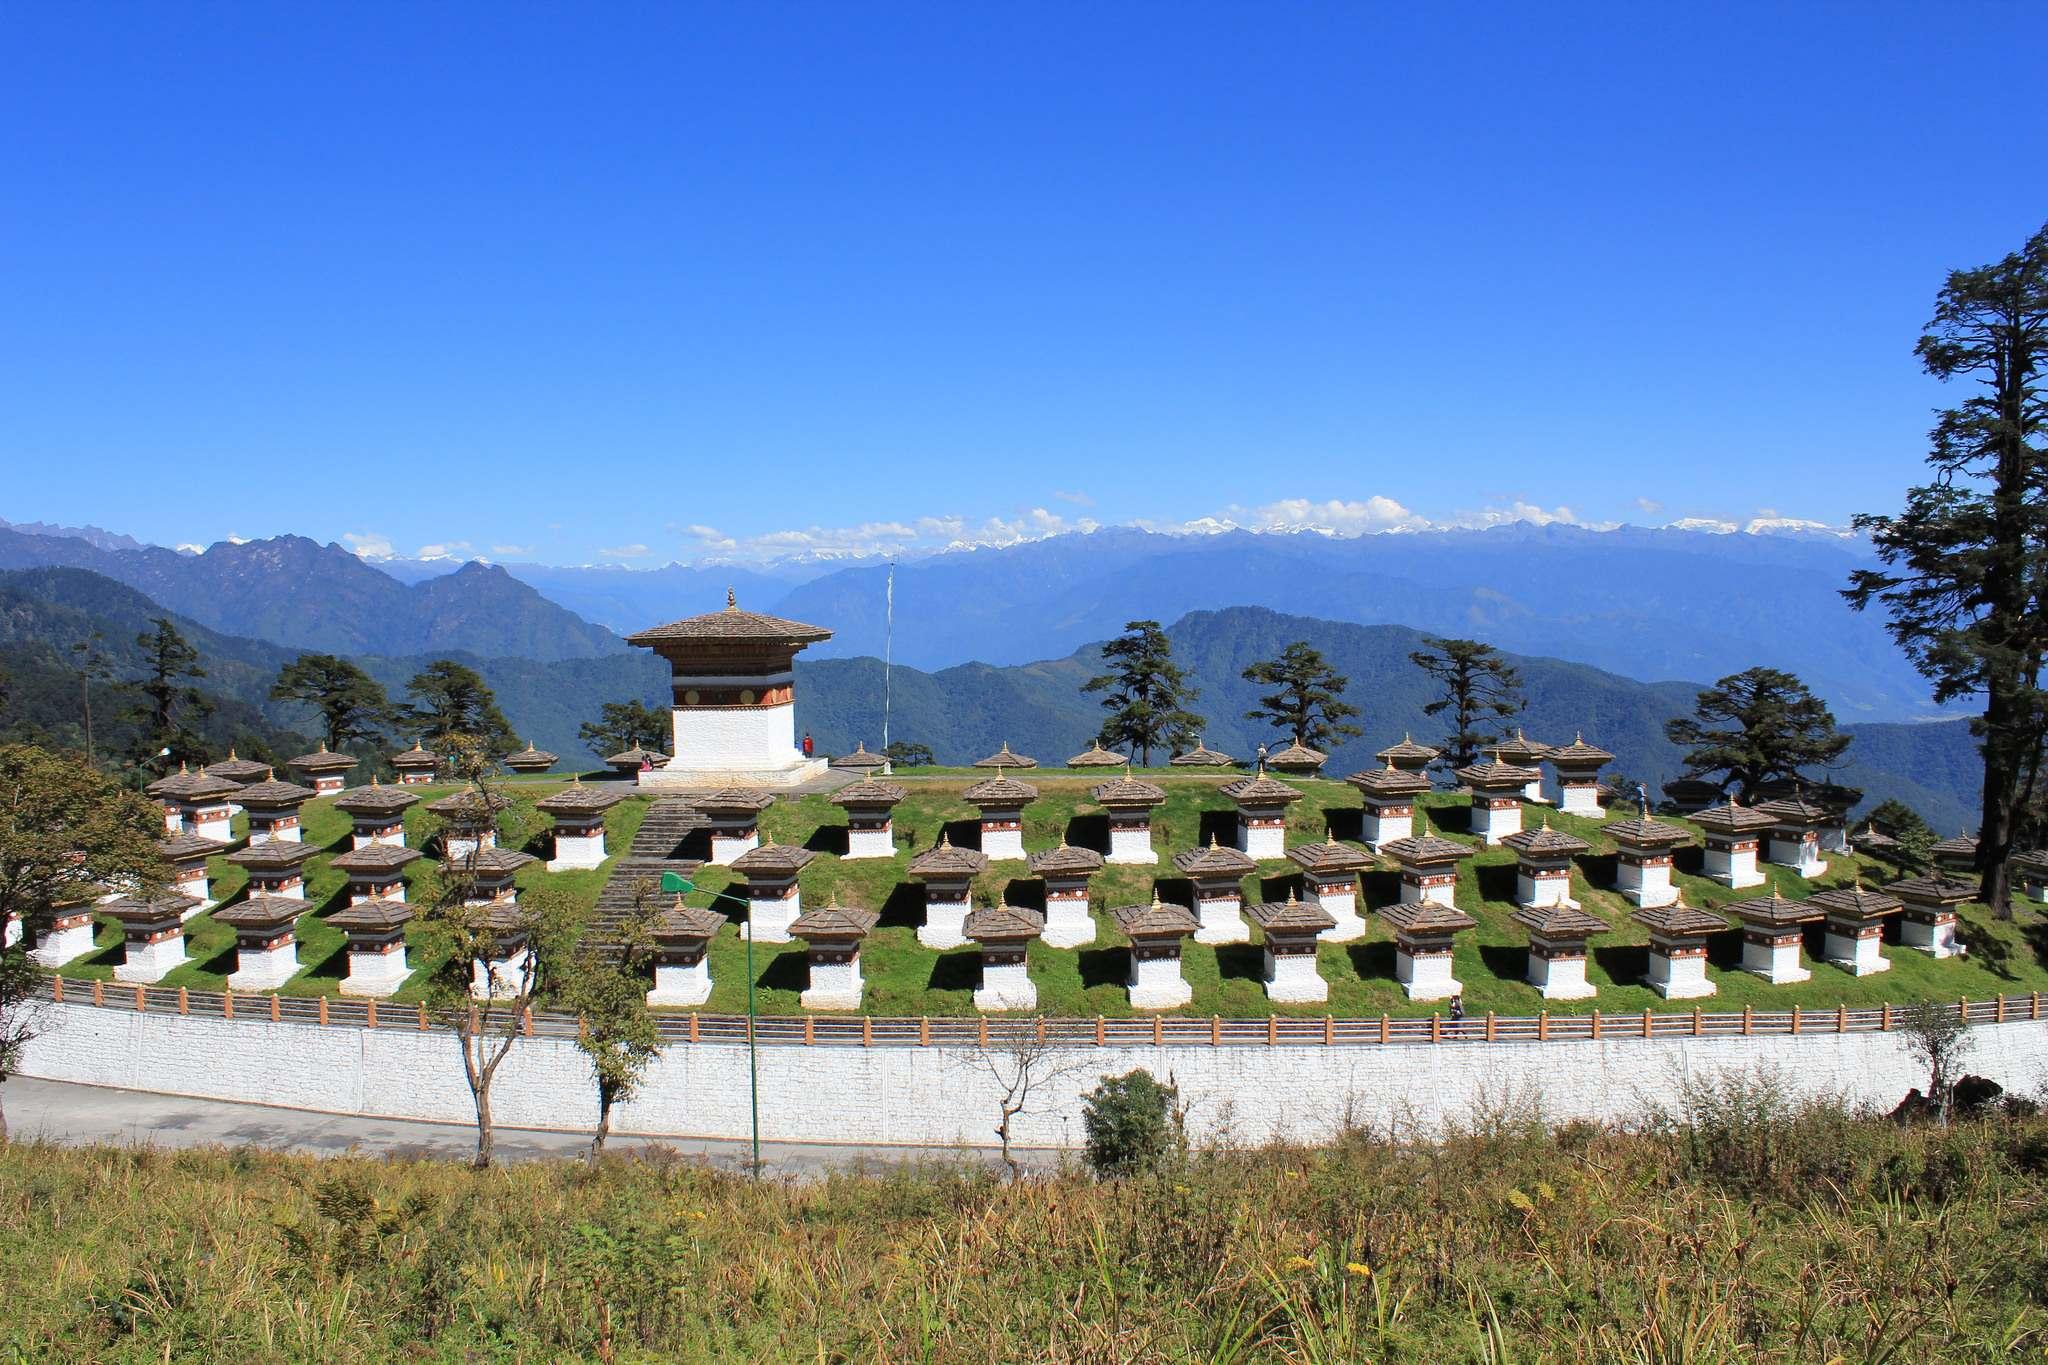 bhutan7 Bhutan   The Land of the Thunder Dragon